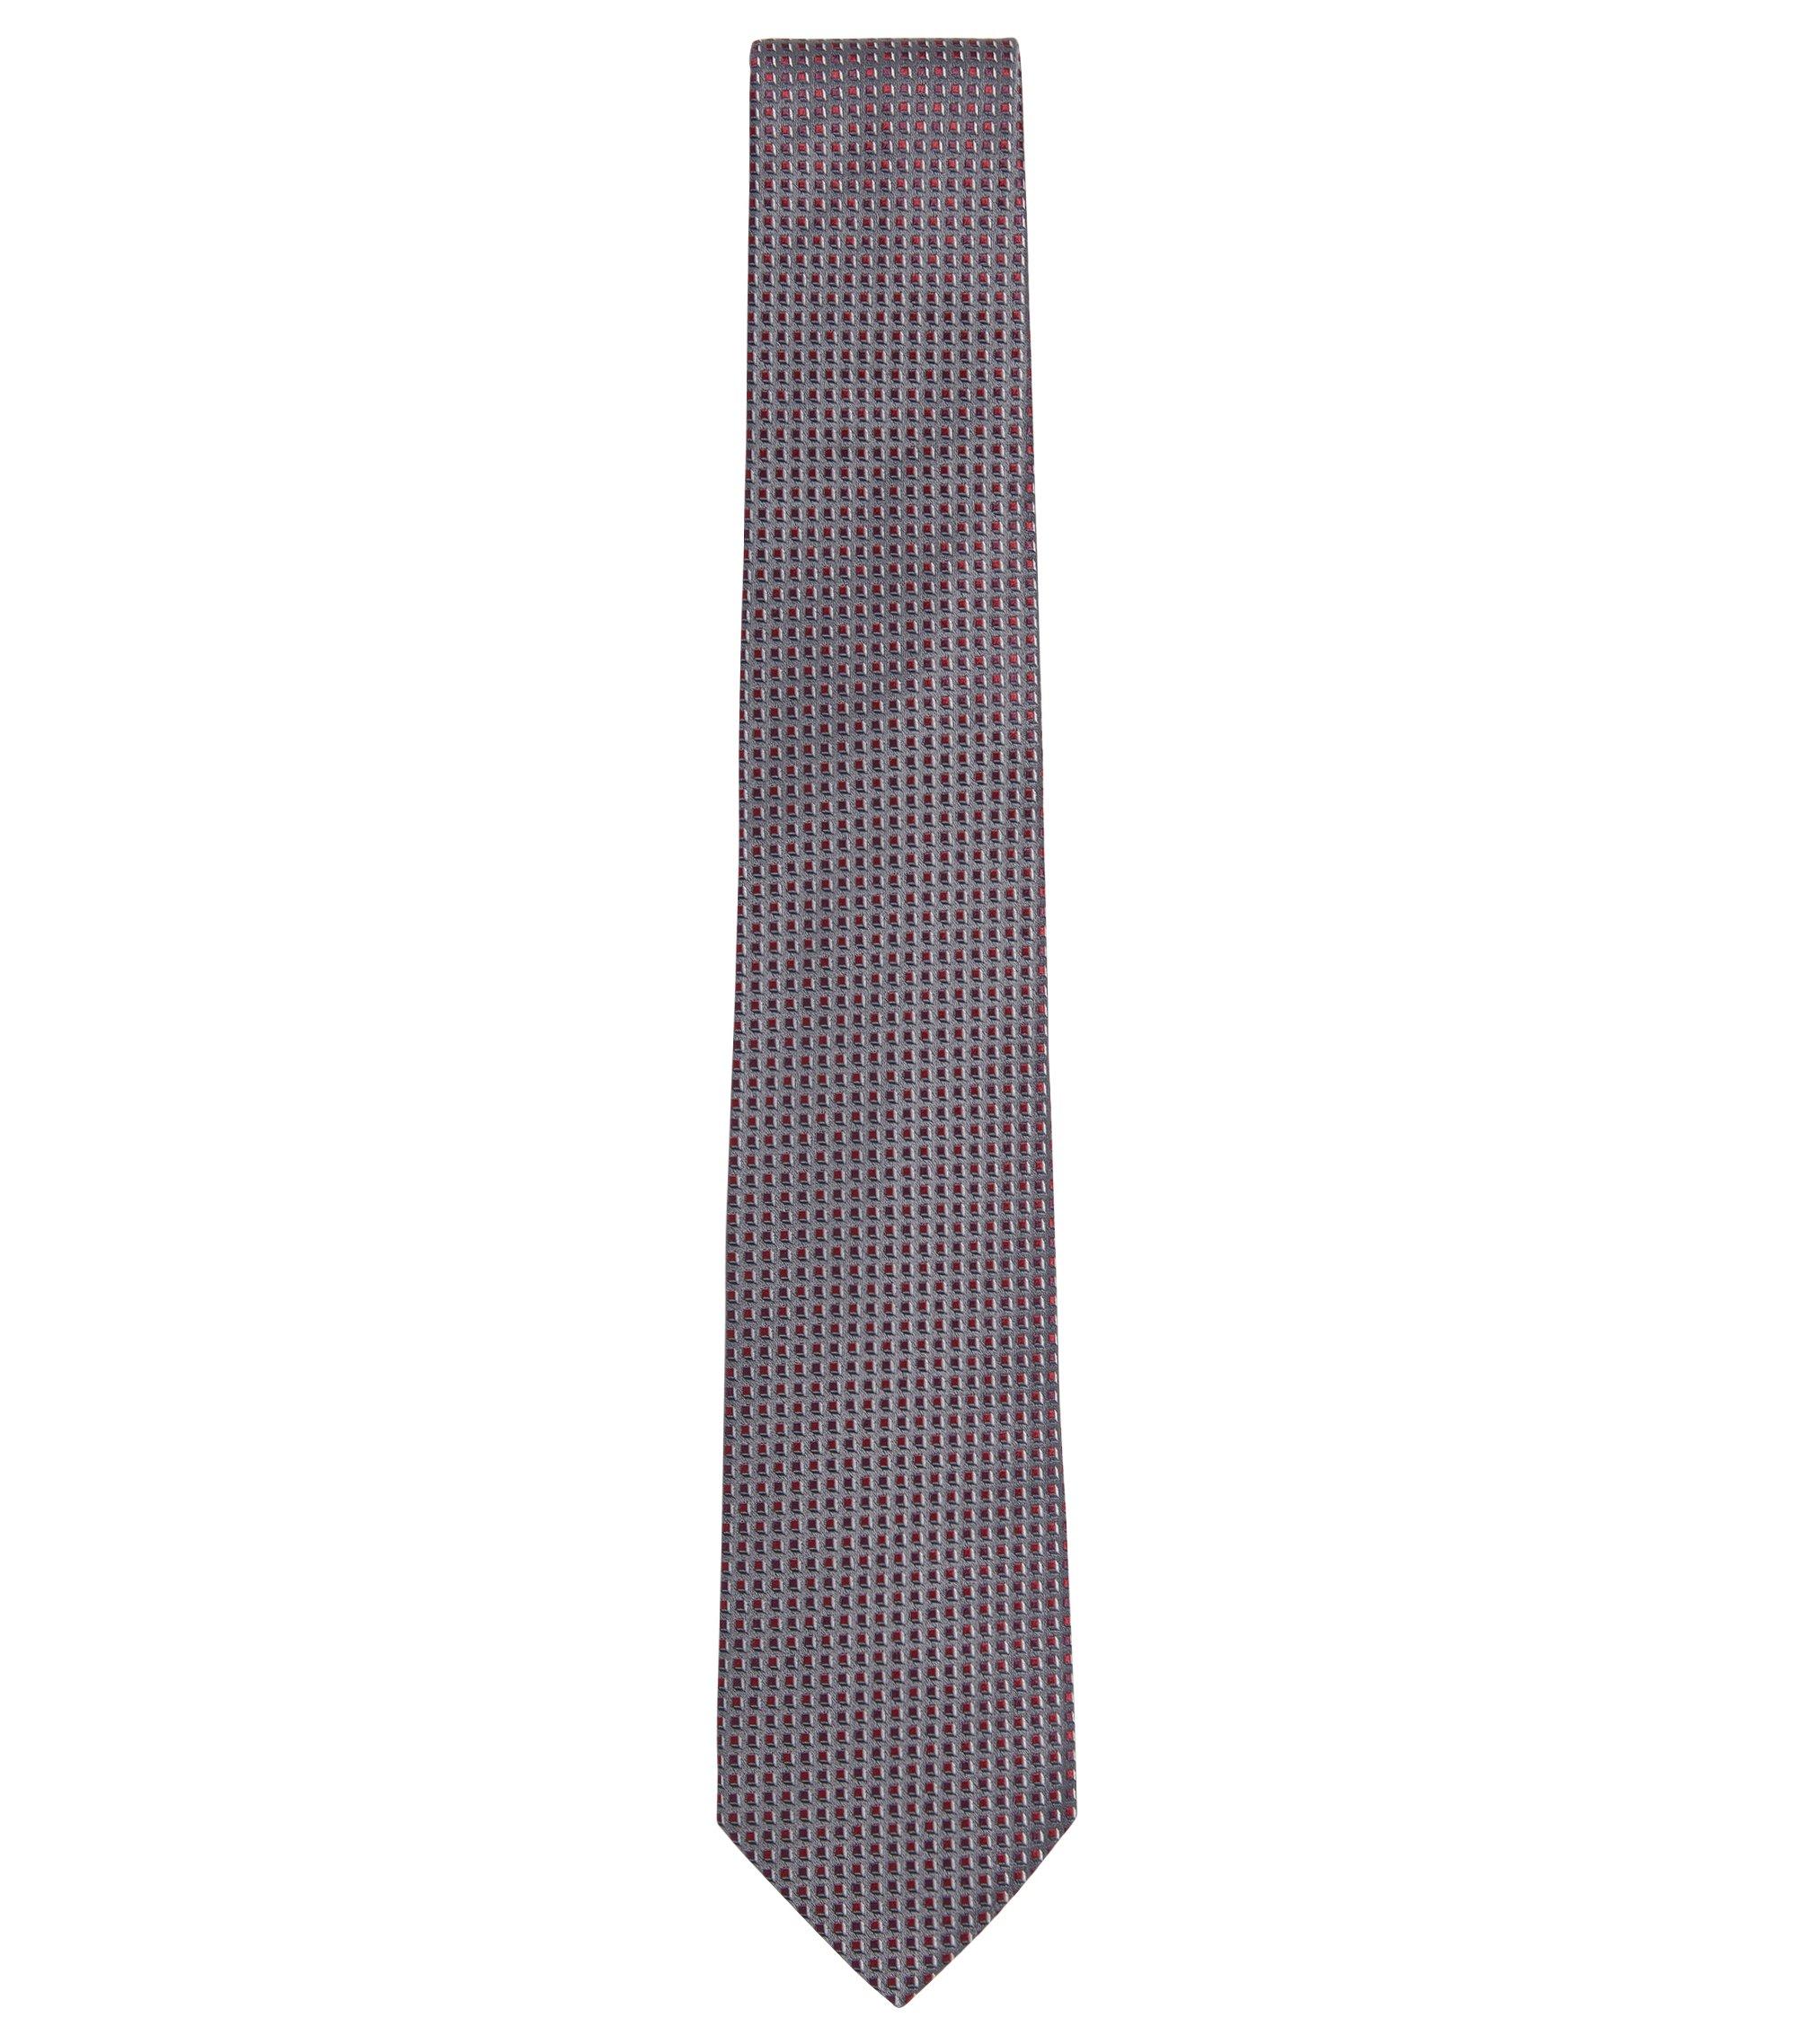 'T-Tie 7.5 cm' | Regular, Italian Silk Patterned Tie, Grey